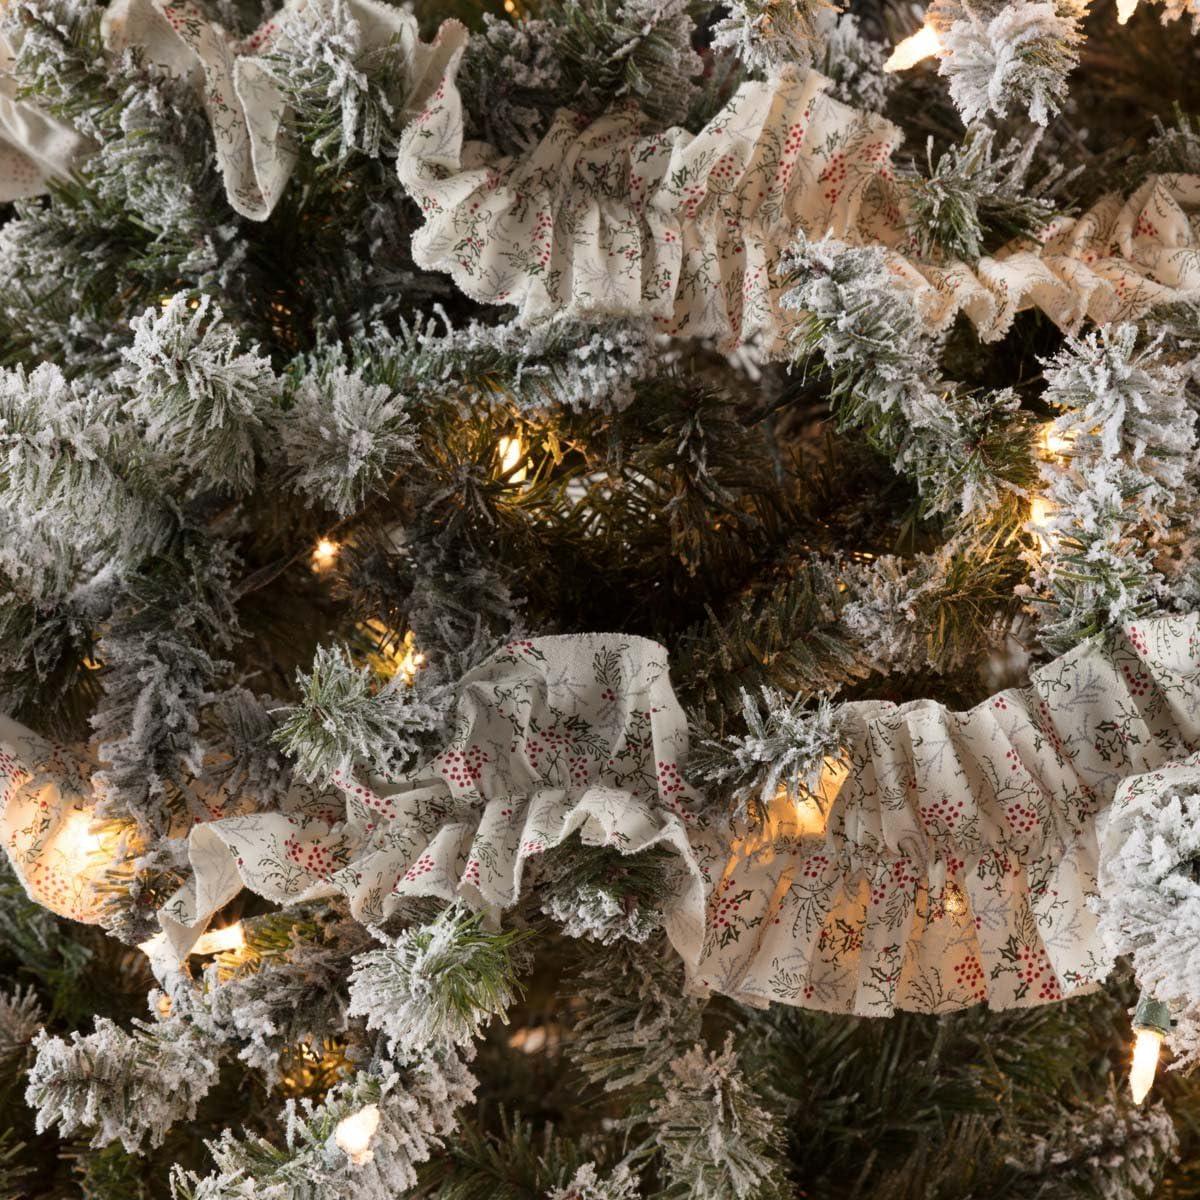 VHC Brands Farmhouse Holiday Decor - Carol White Garland Set of 3, Grey